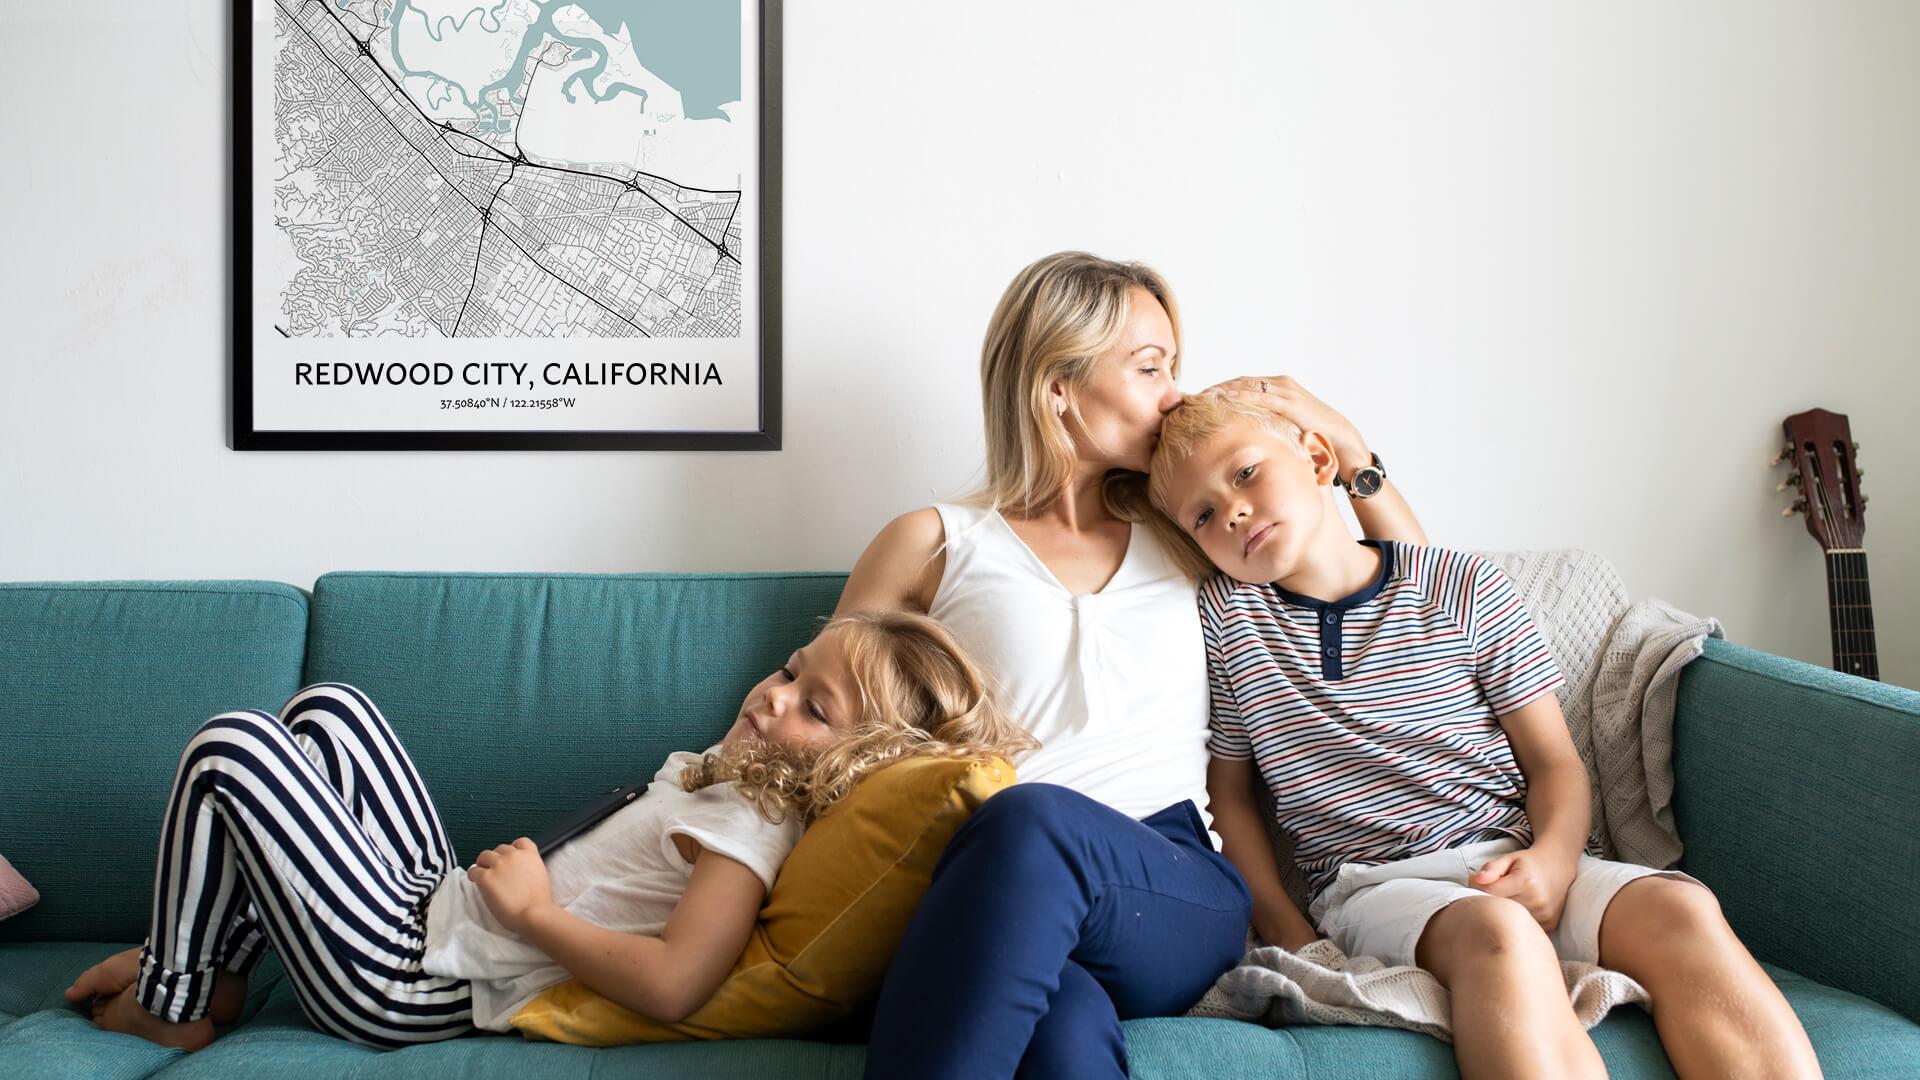 Redwood City map poster